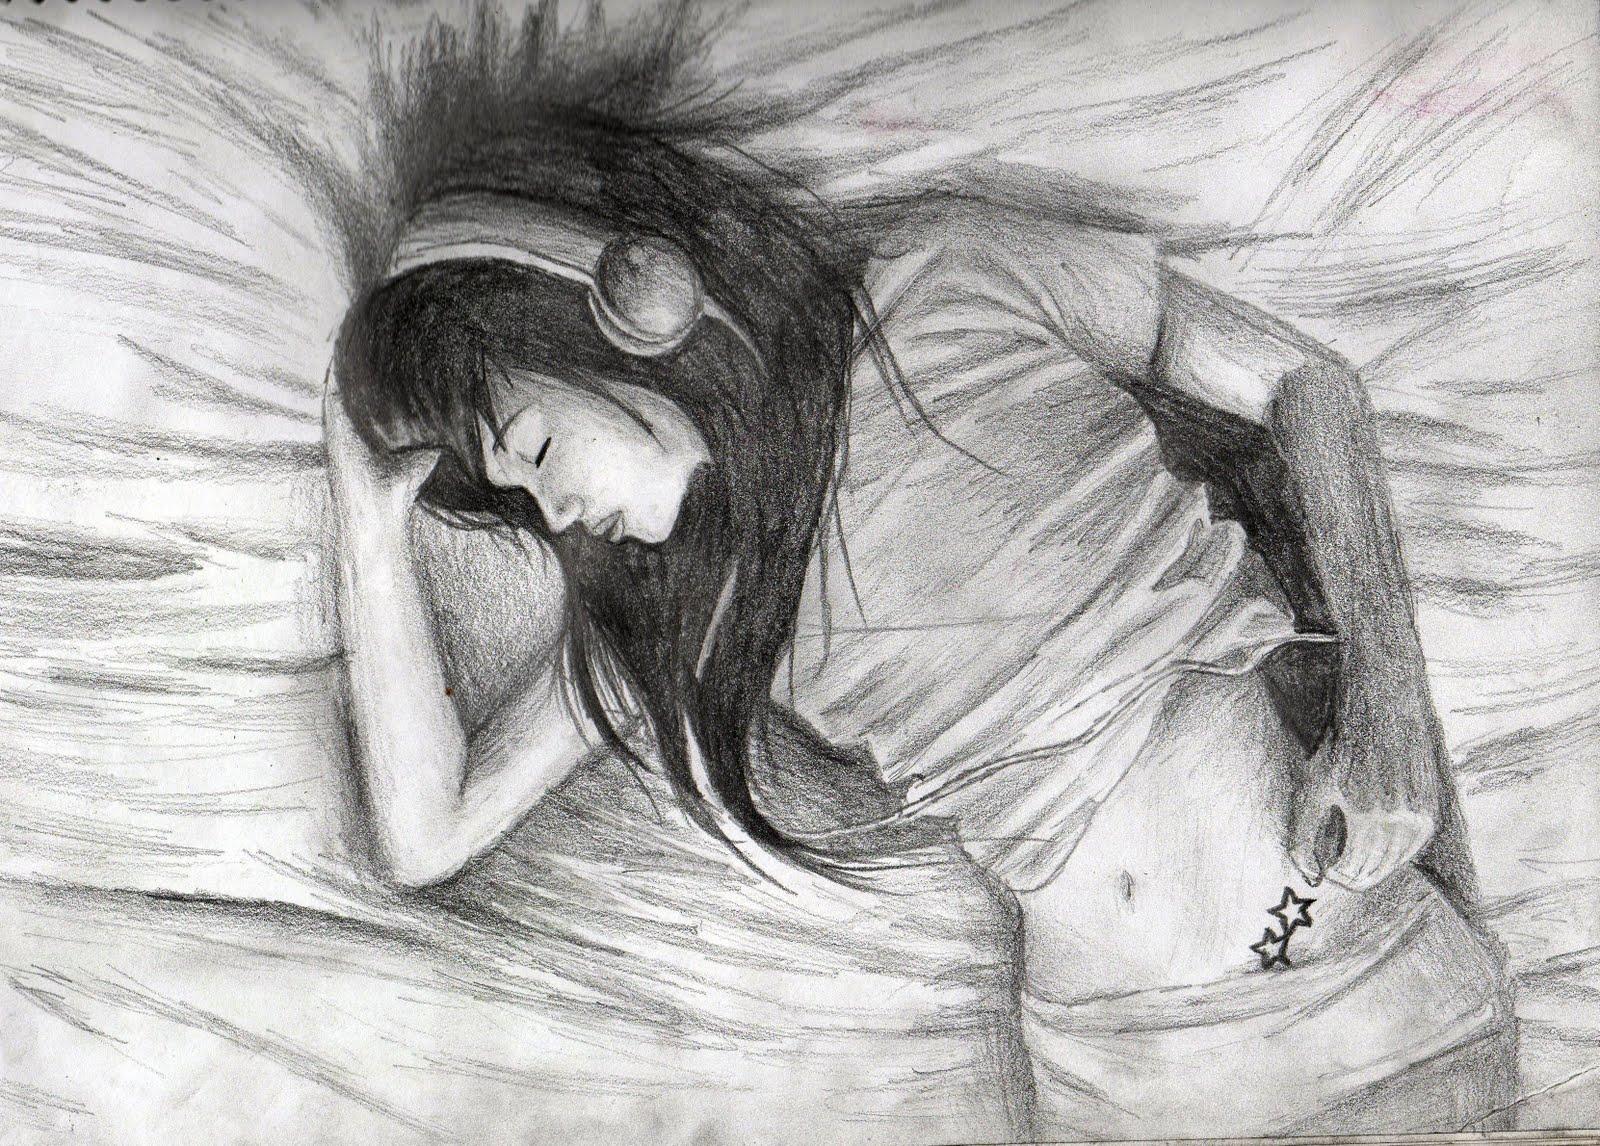 http://4.bp.blogspot.com/_B-lf6oLp2cQ/TI-mPTzBZjI/AAAAAAAAAaI/dY_MeWkkKNE/s1600/sleep%2Bmusic.jpg